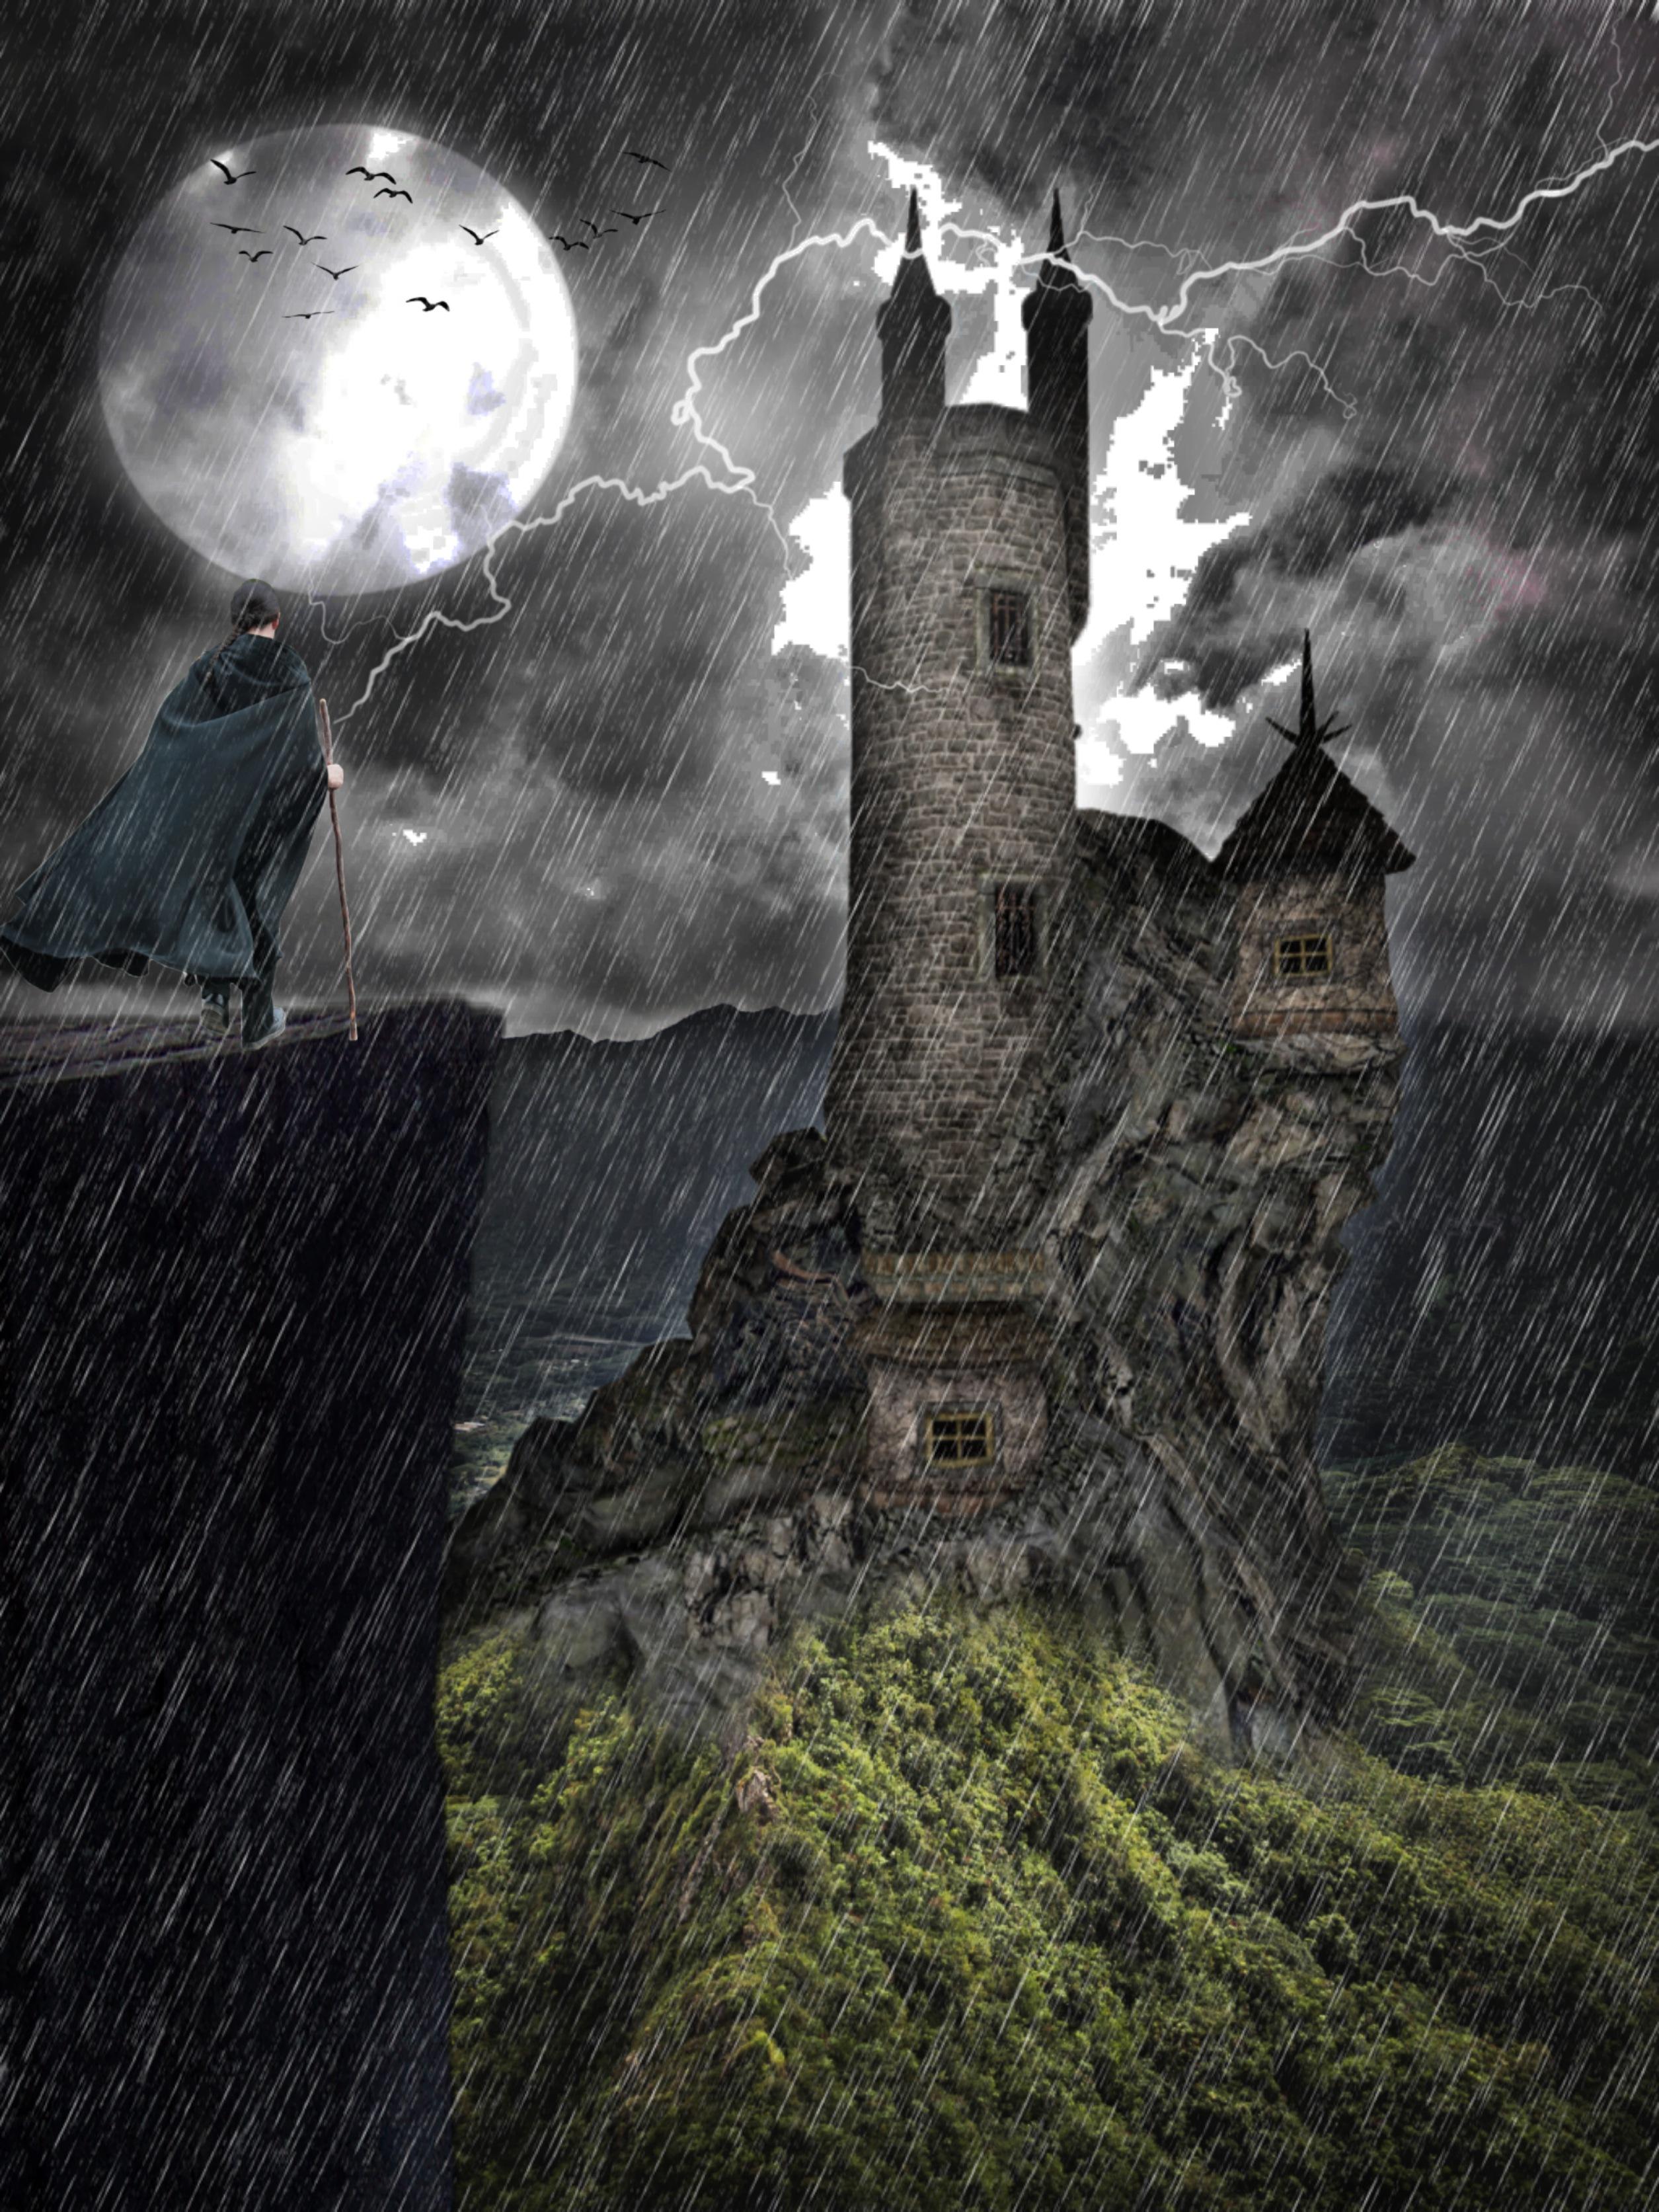 #freetoedit #myedit #madewithpicsart #editedbyme #editedwithpicsart #picsart #nature #landscape #flash #replay #moon